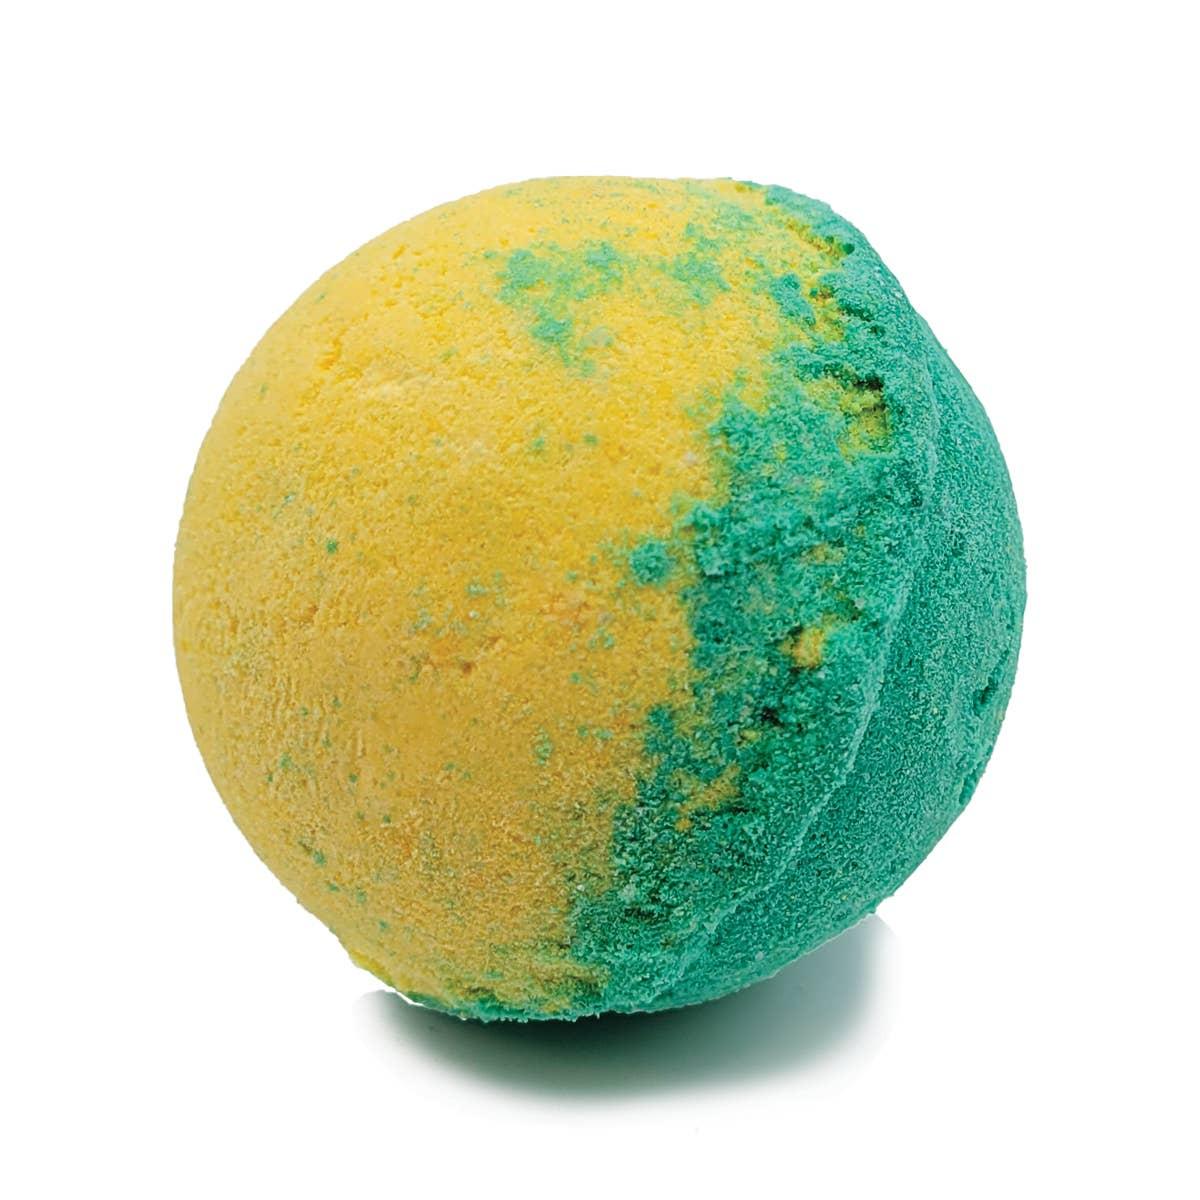 Evolve - Bath Bomb - Tangerine Grapefruit | Trada Marketplace